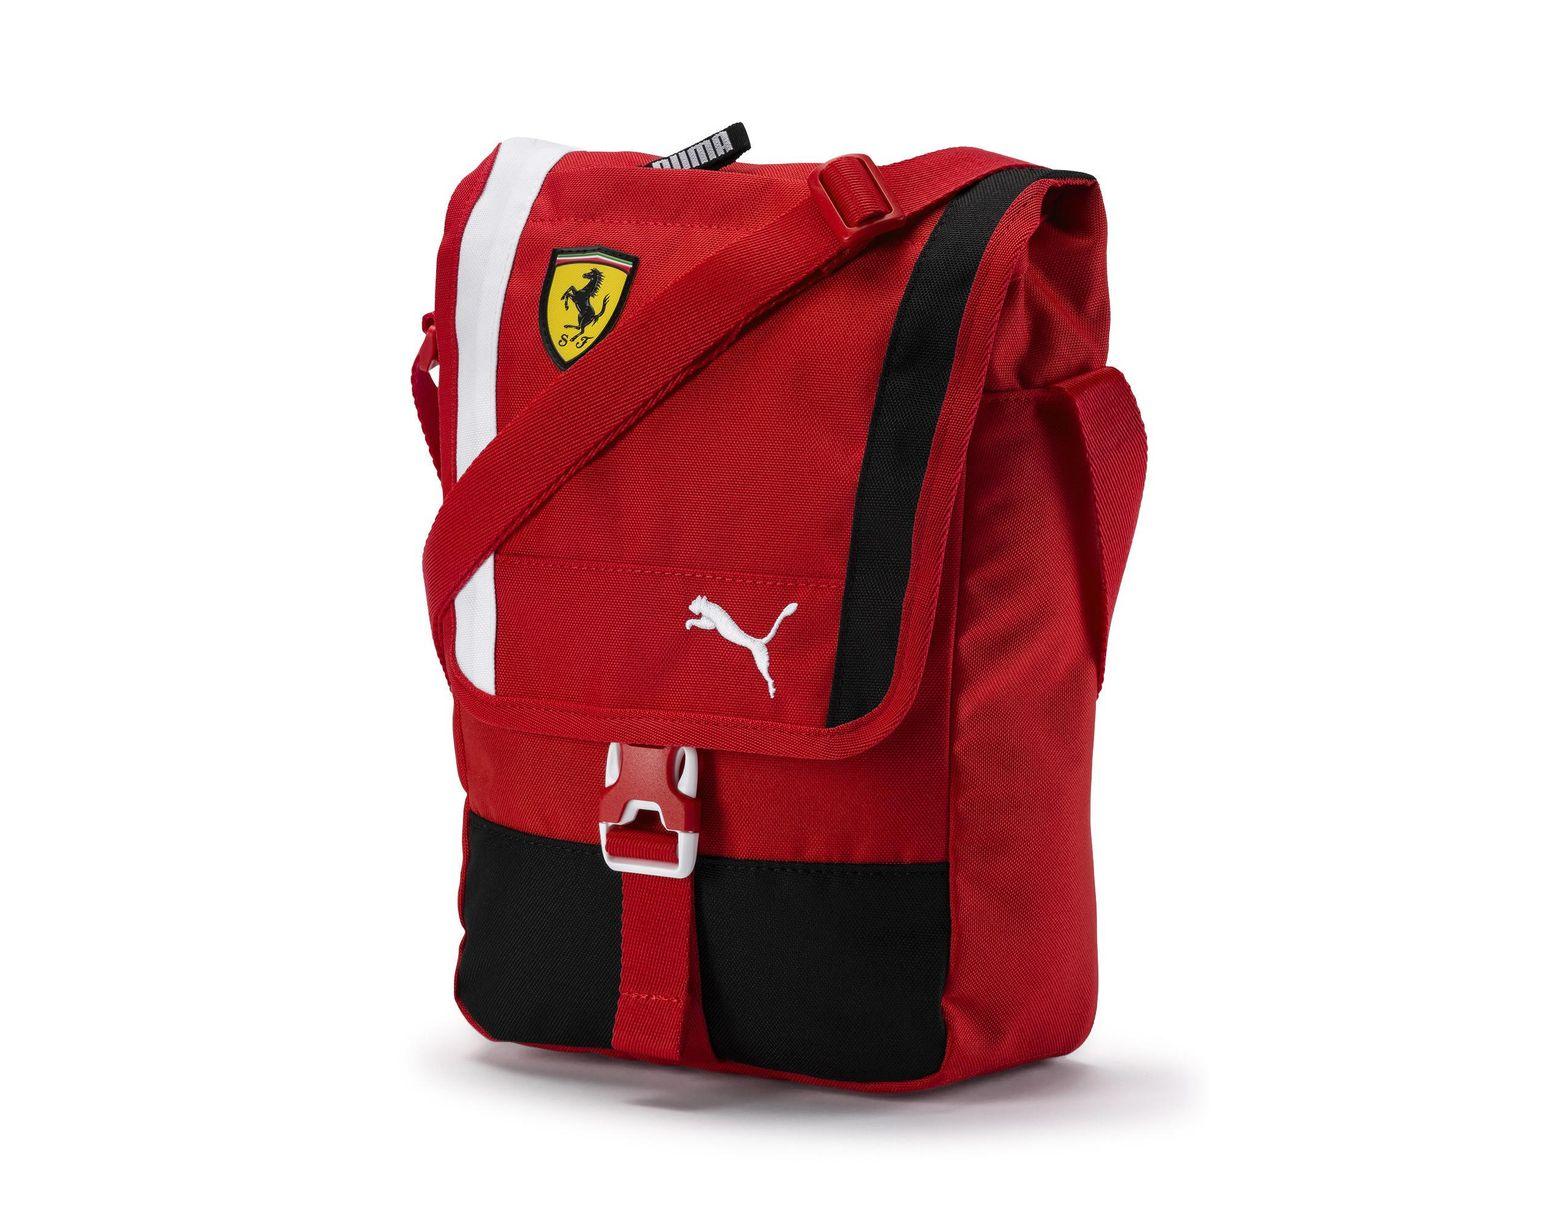 14bfcbfa0cb15 PUMA Scuderia Ferrari Fanwear Portable in Red for Men - Lyst